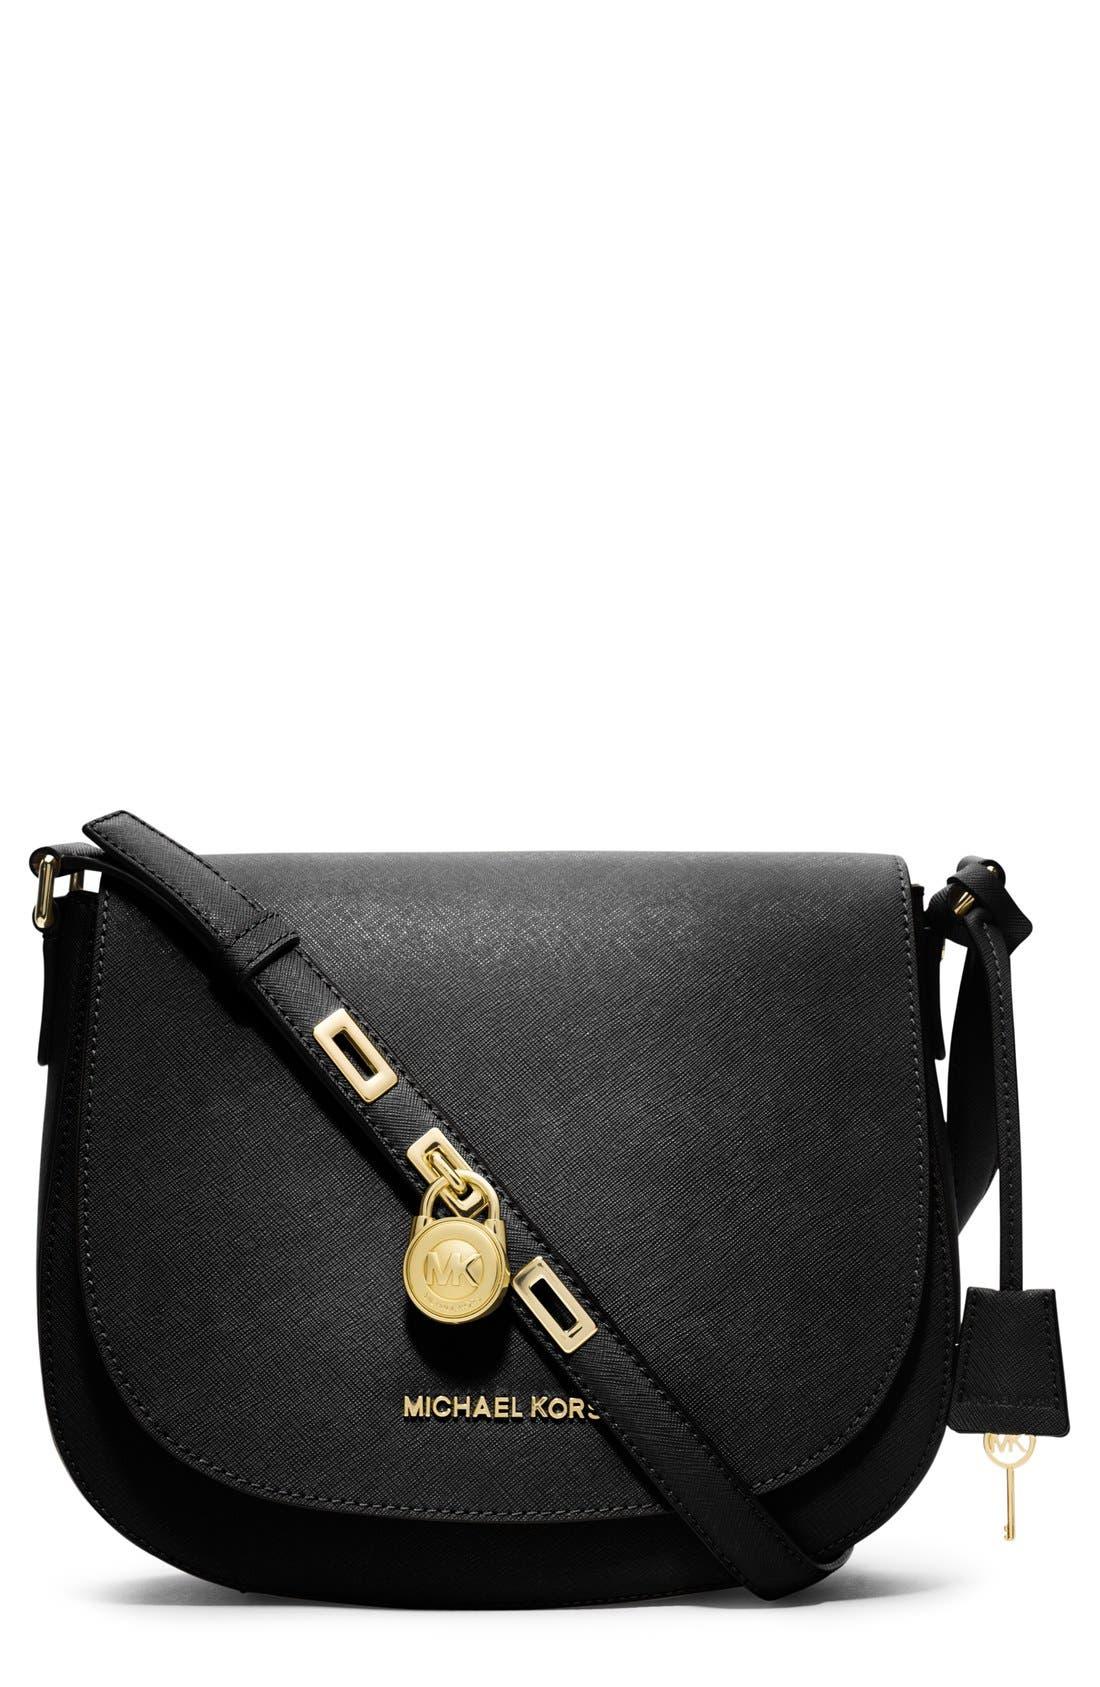 Main Image - MICHAEL Michael Kors 'Large' Saffiano Leather Messenger Bag